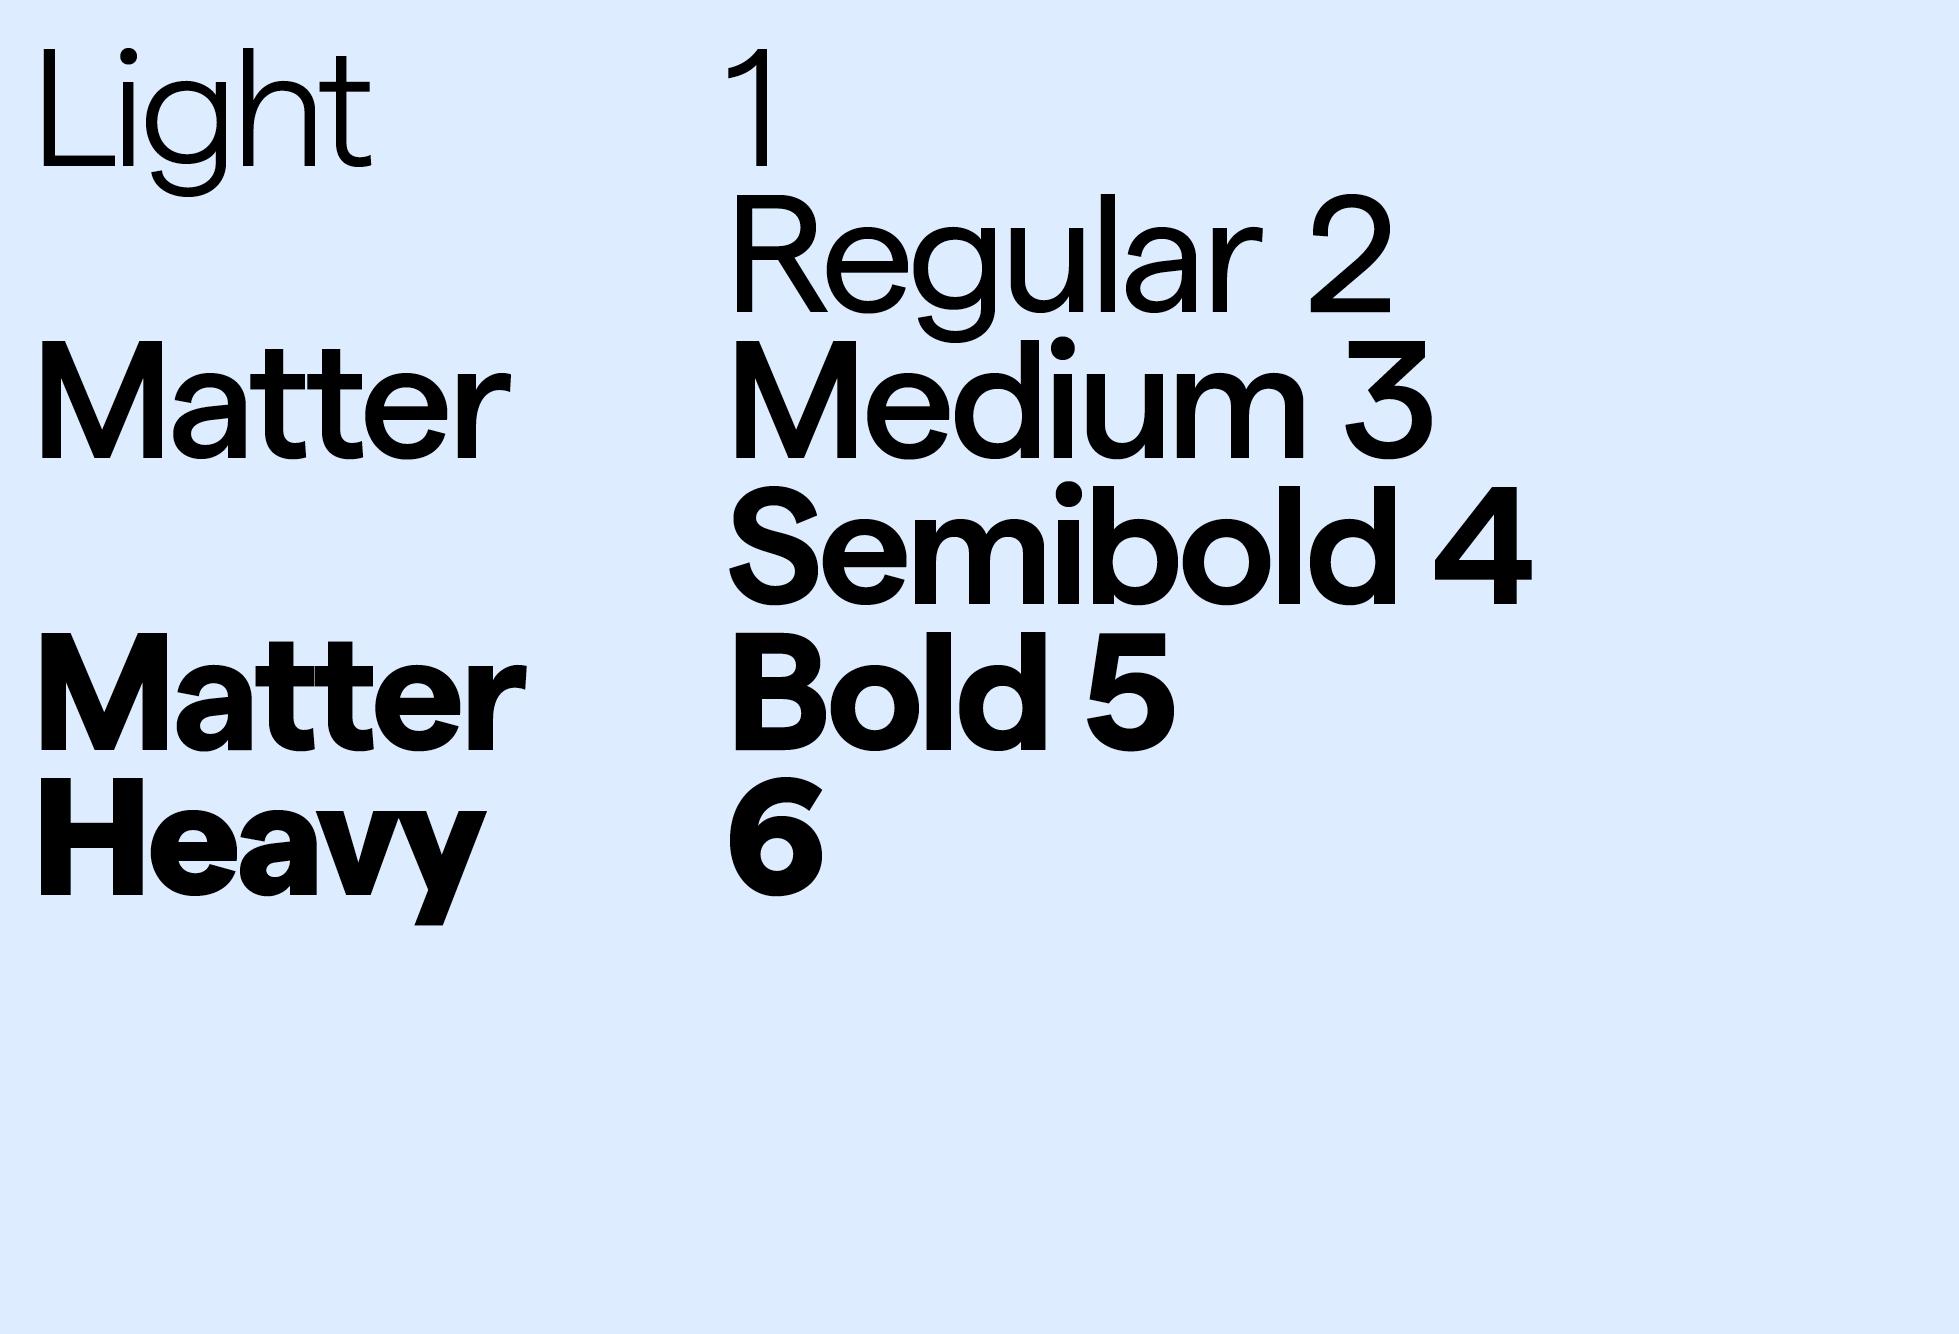 Matter Weights & Styles